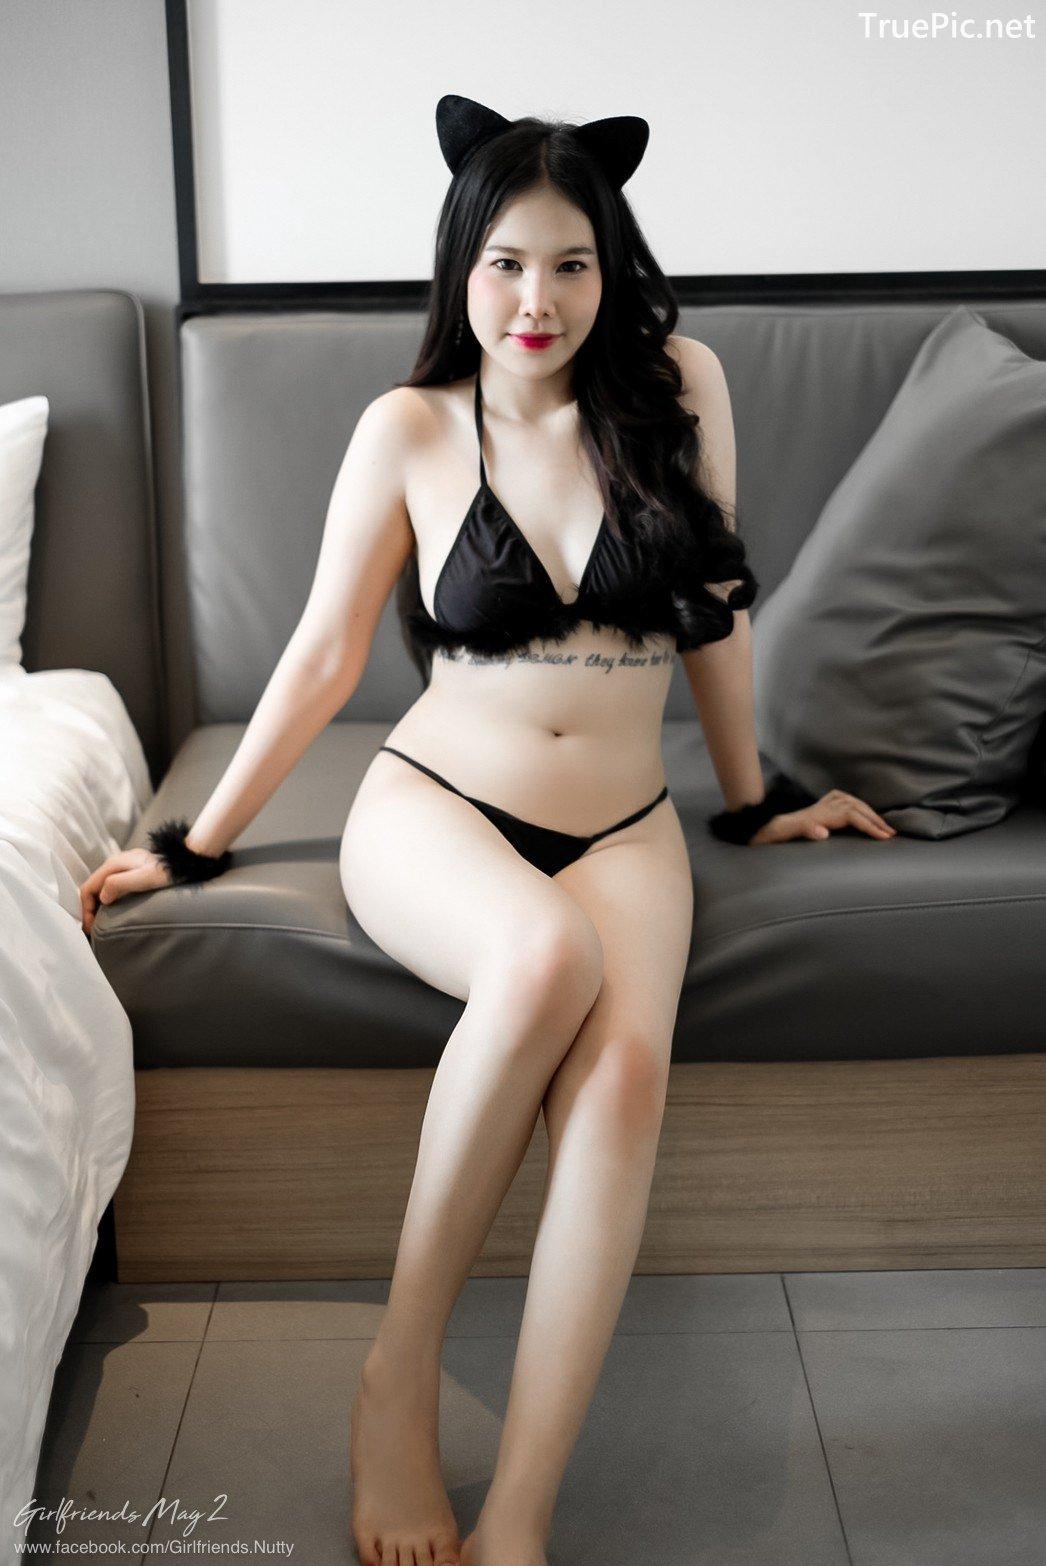 Image Thailand Model - Chanunshida Phuangsombut - Sexy Black Cat - TruePic.net - Picture-2